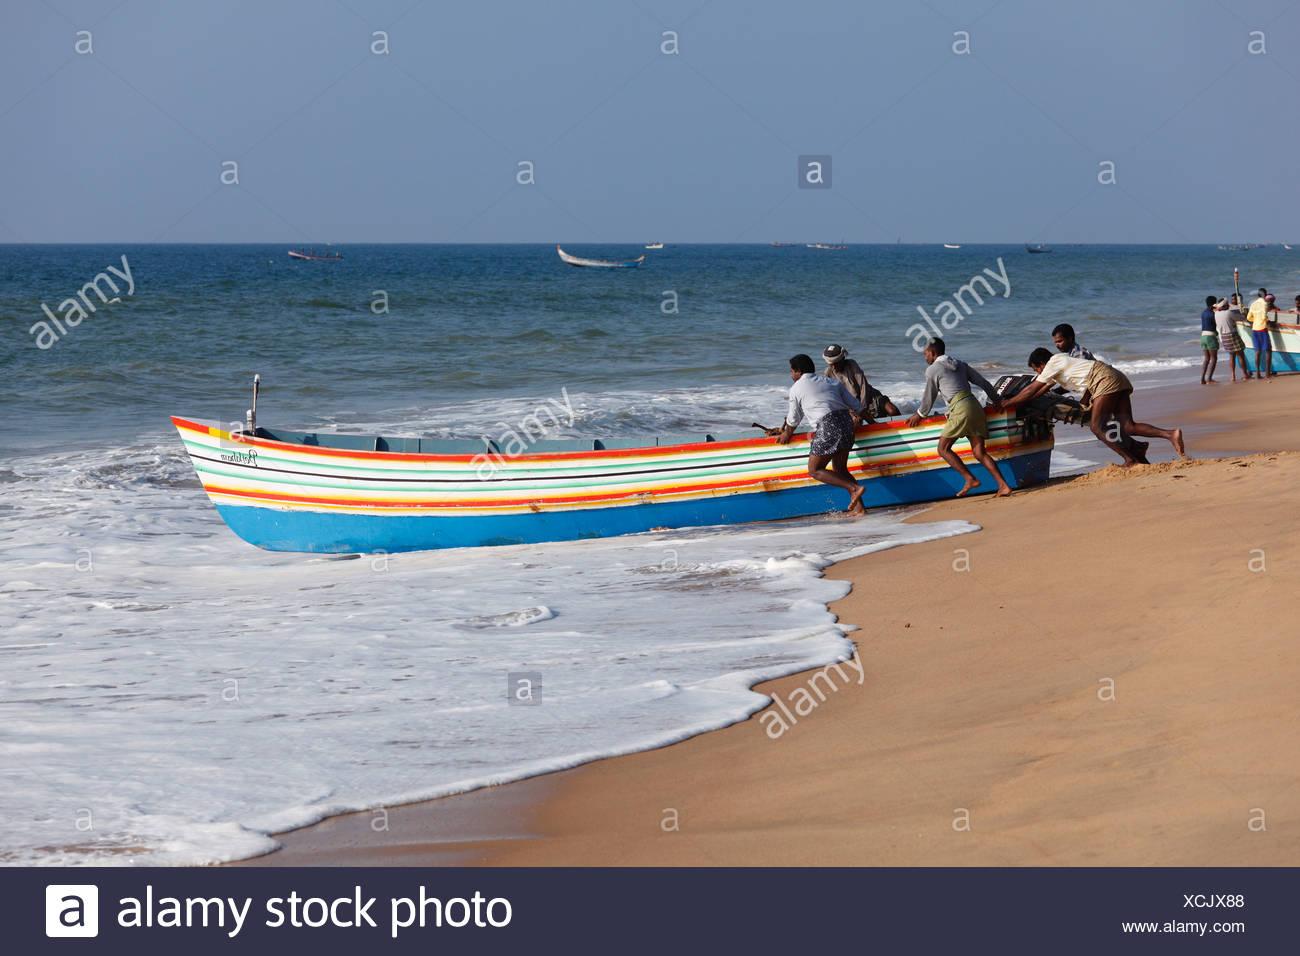 Fishermen pushing their fishing boat into the sea, Somatheeram Beach, Malabarian Coast, Malabar, Kerala state, India, Asia - Stock Image